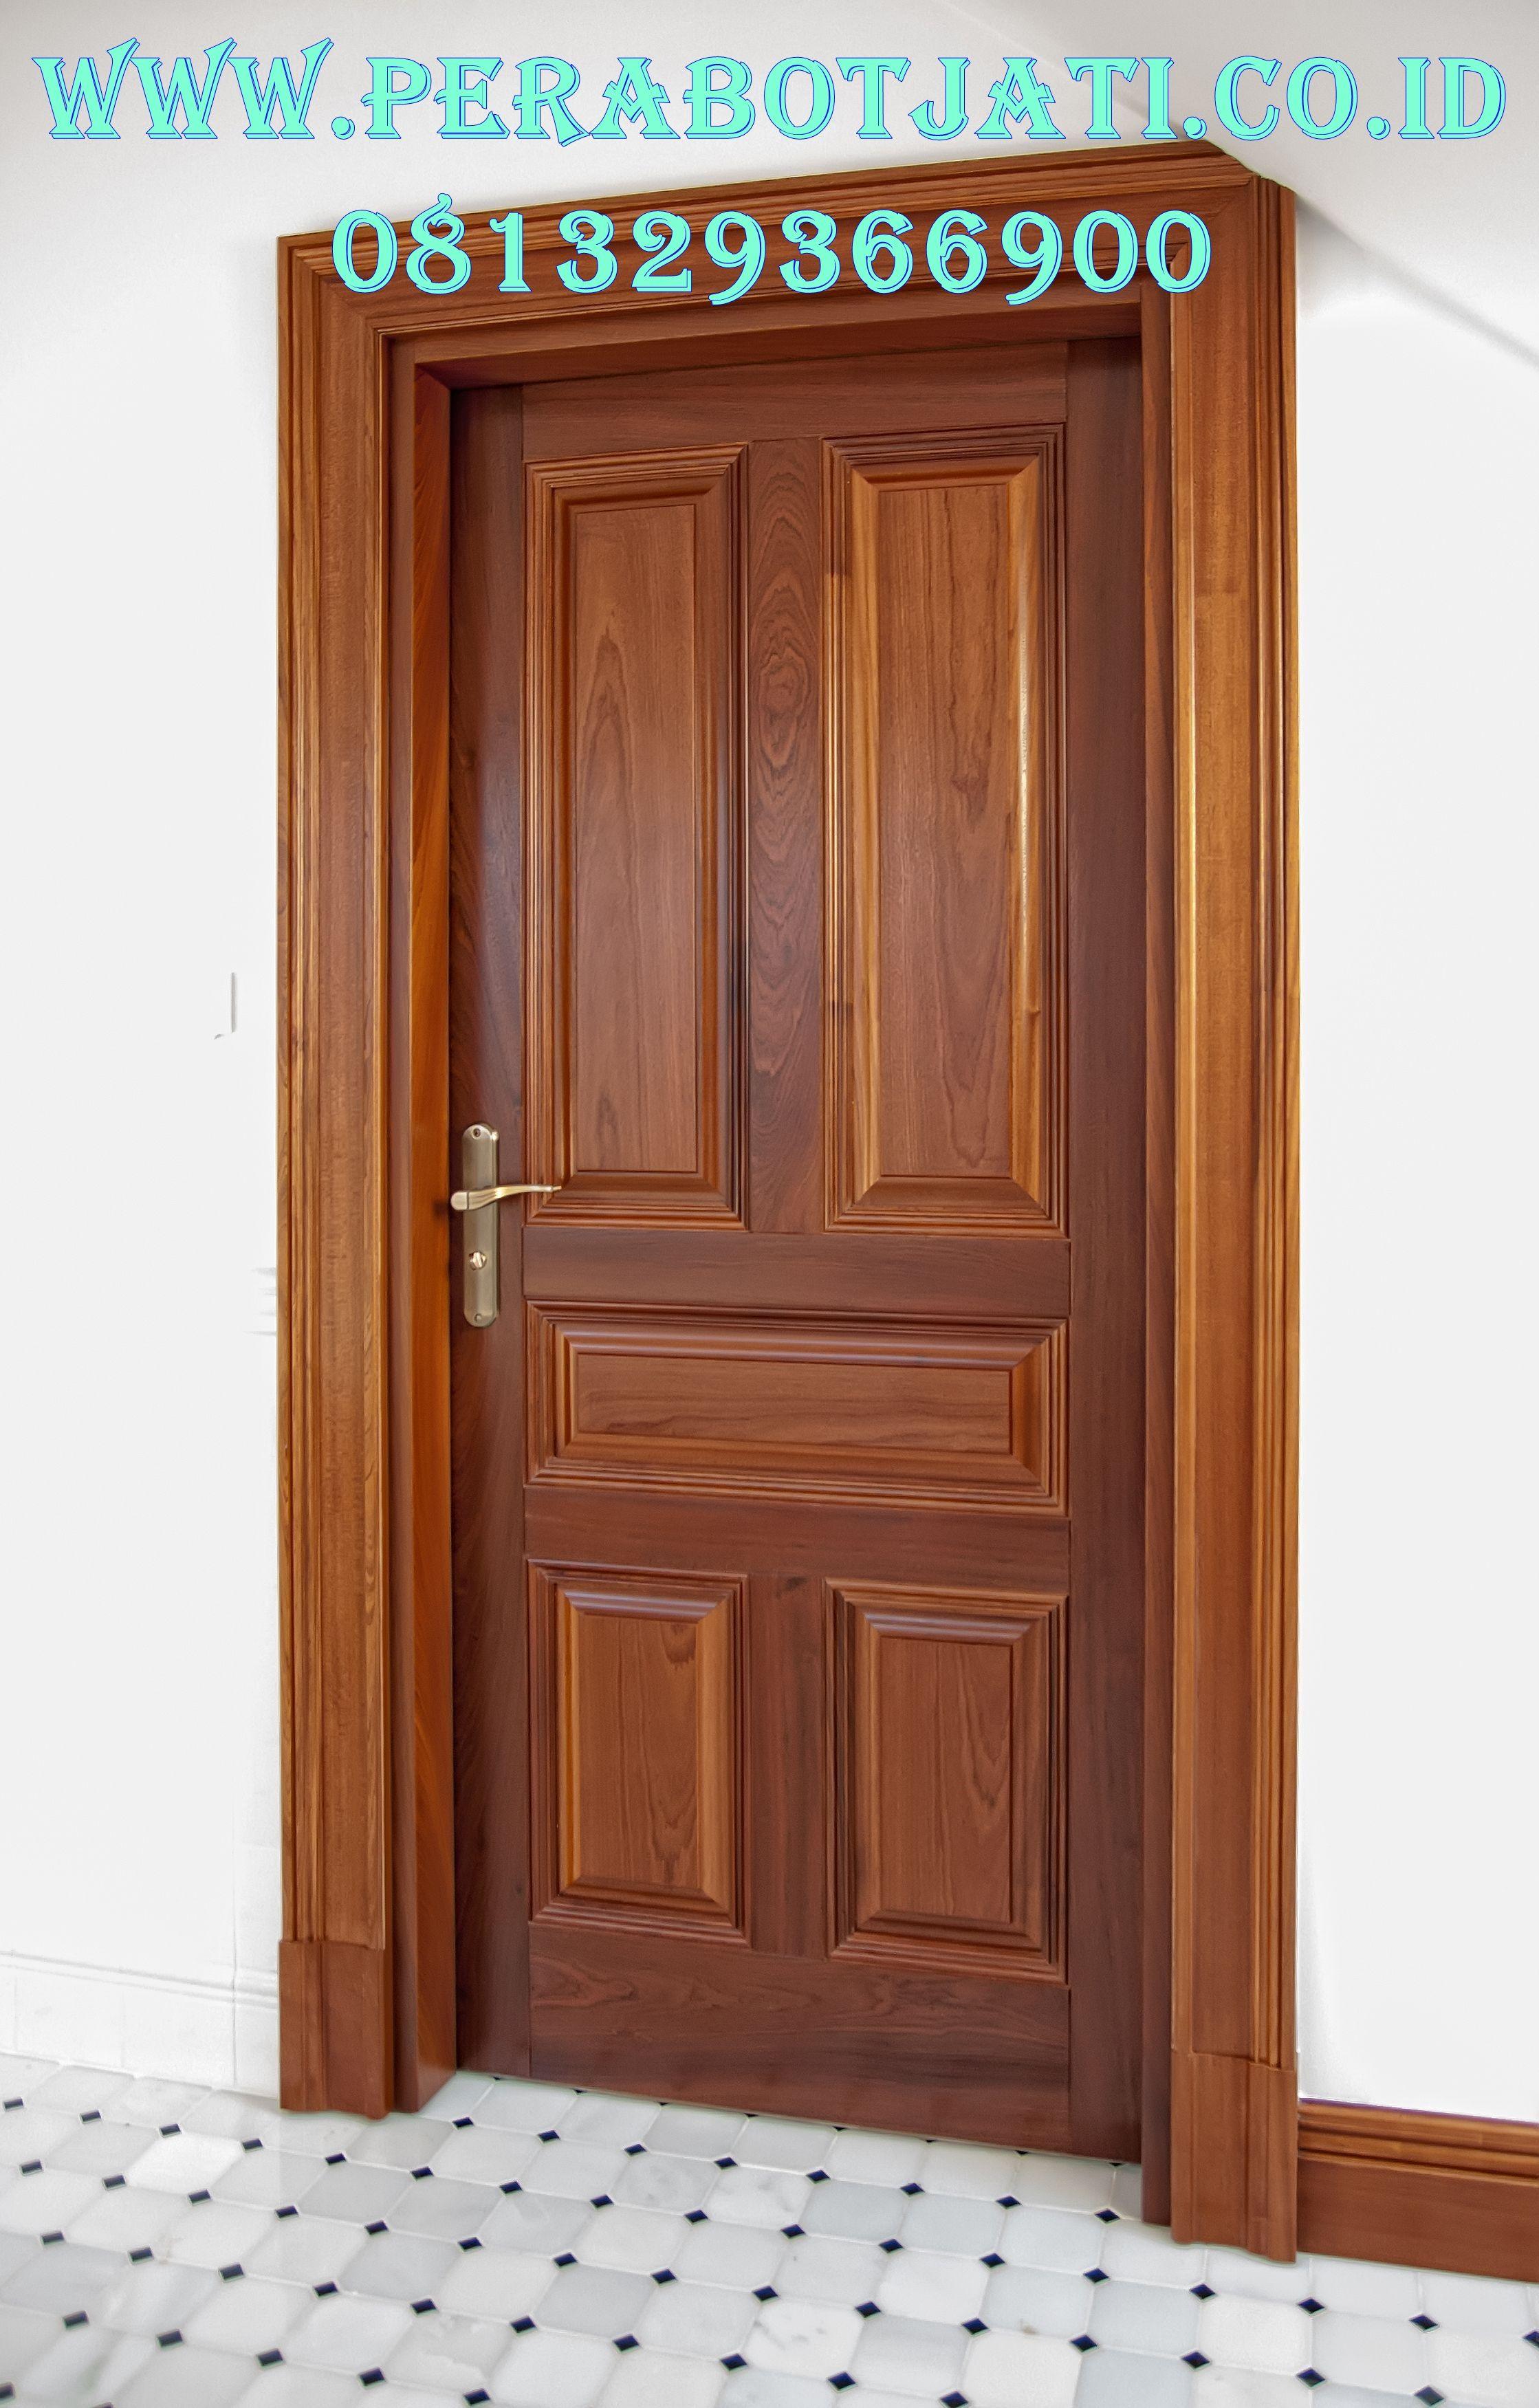 Pintu Kamar Kayu Jati Minimalis Terbaru Kayu Kayu Jati Pintu Gambar daun pintu